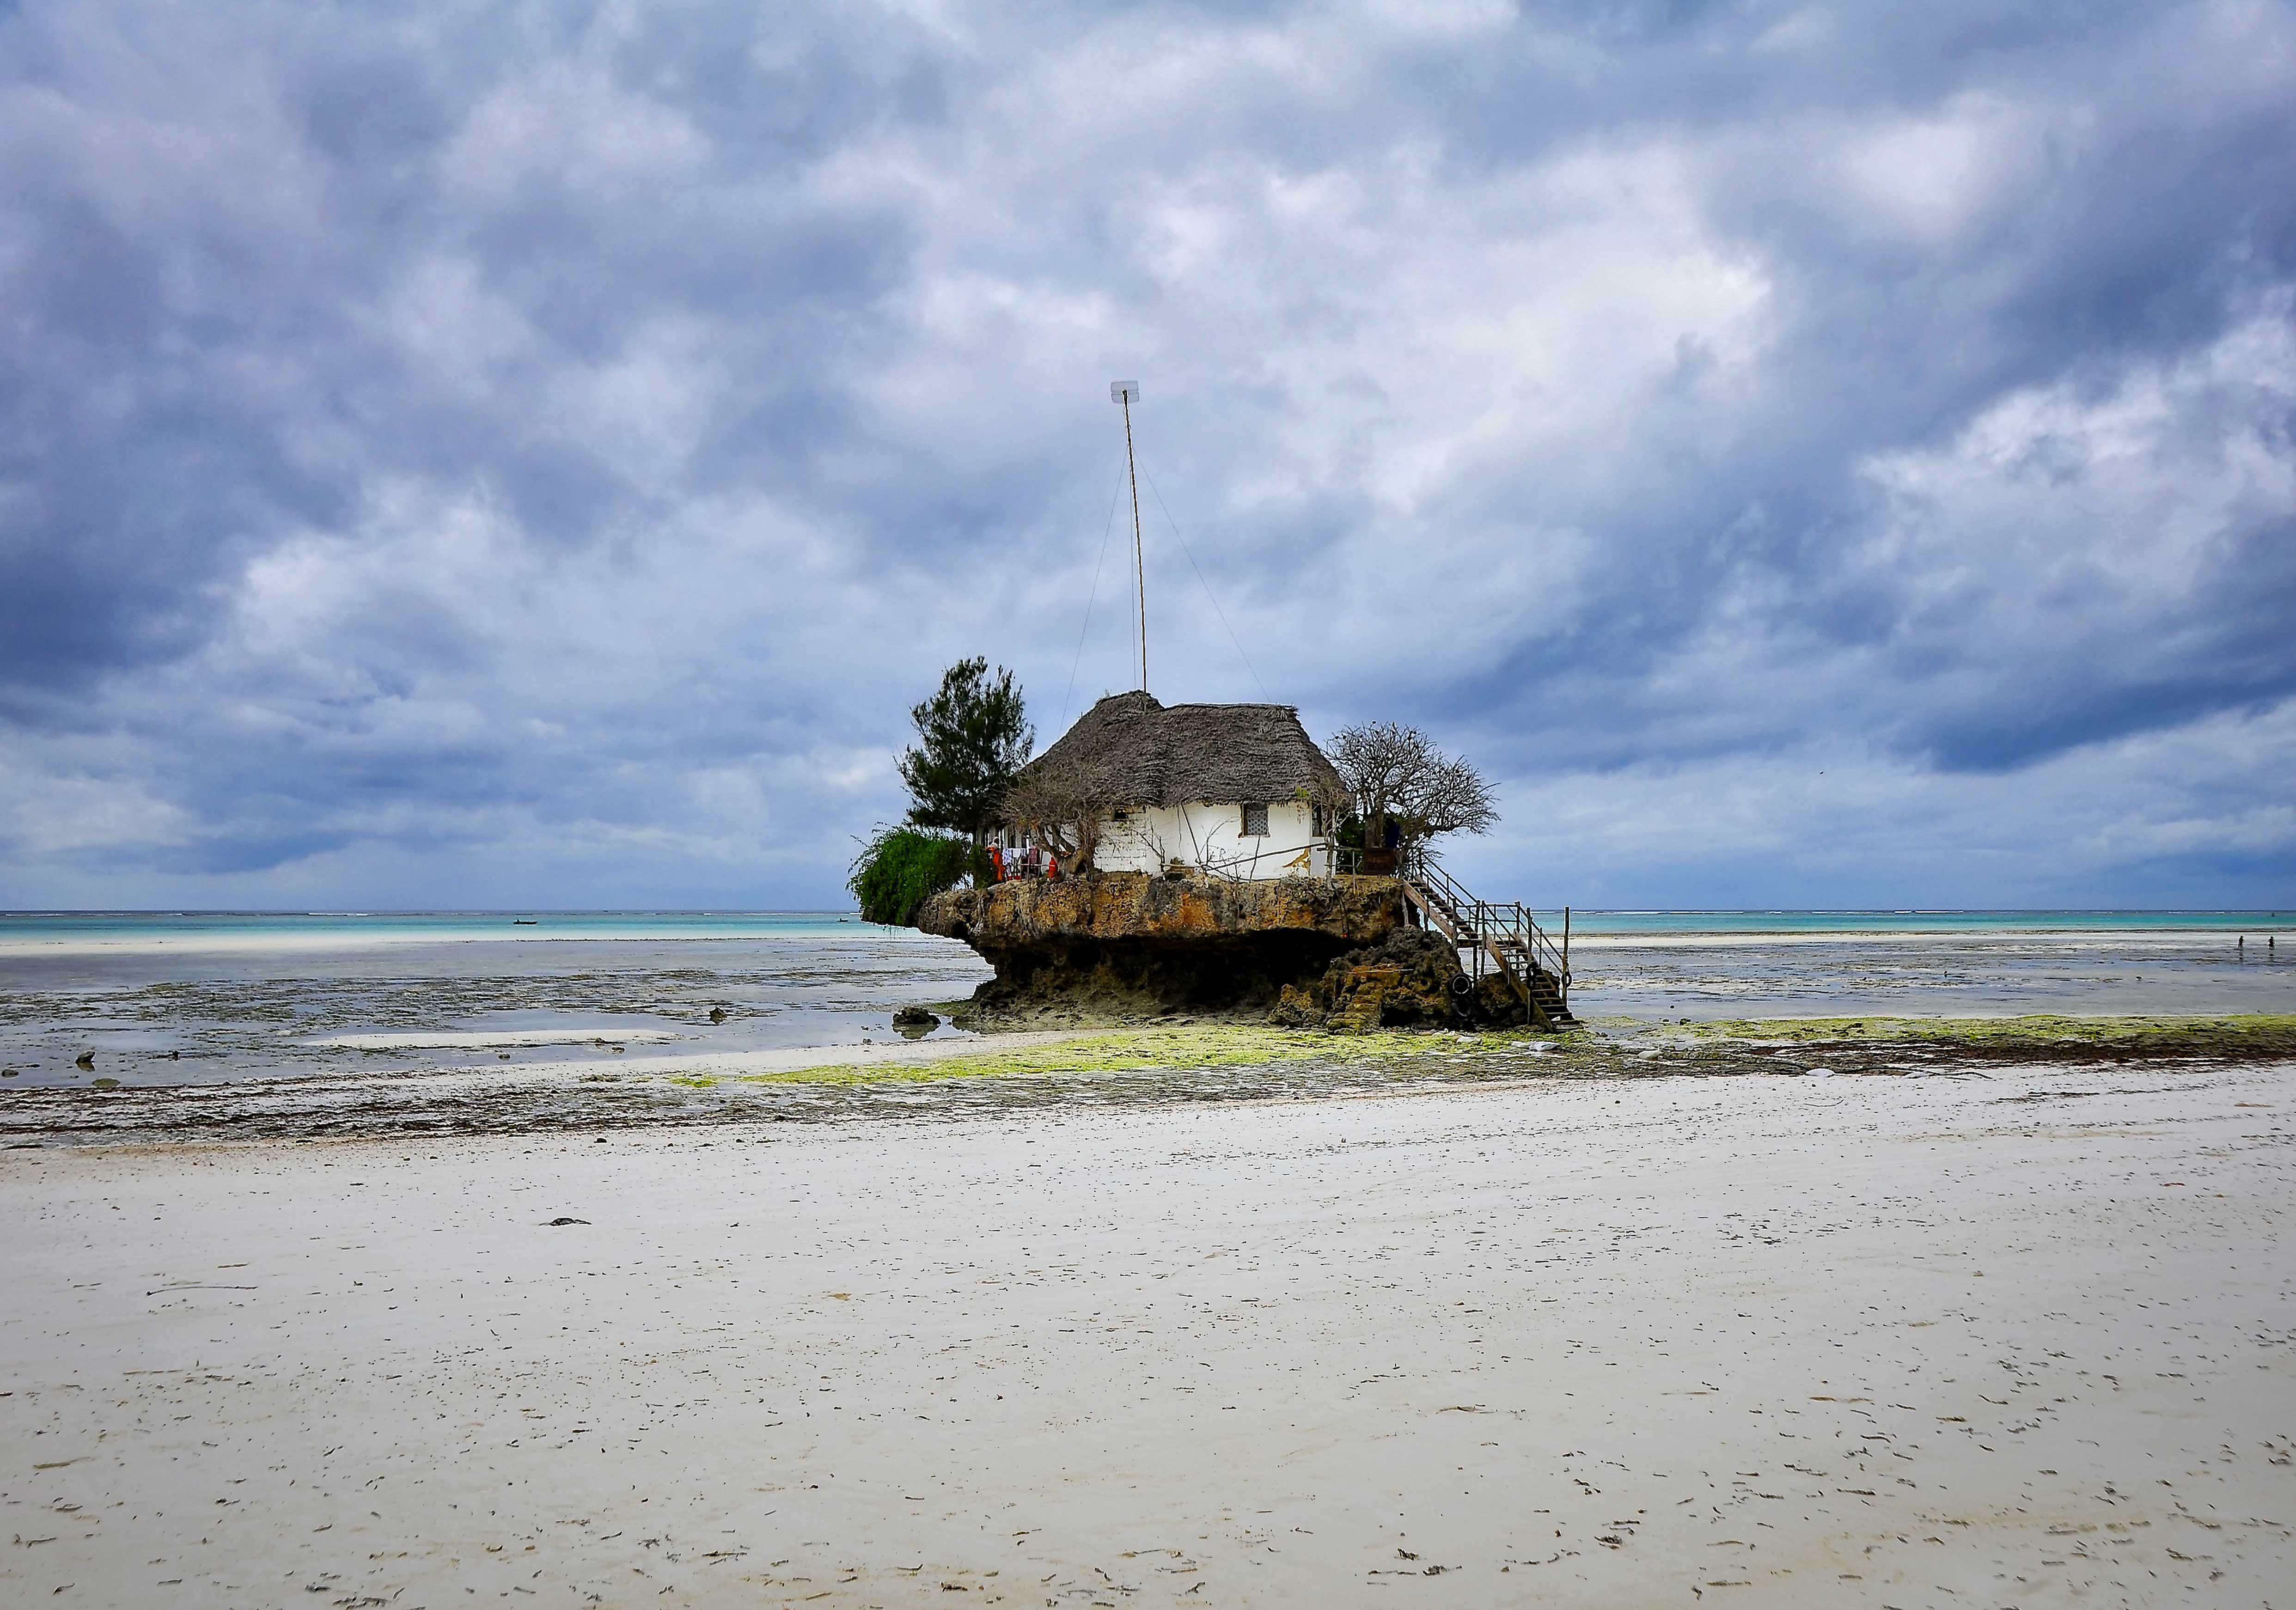 De Haute Qualite File:The Rock Restaurant, Zanzibar (27026086635)